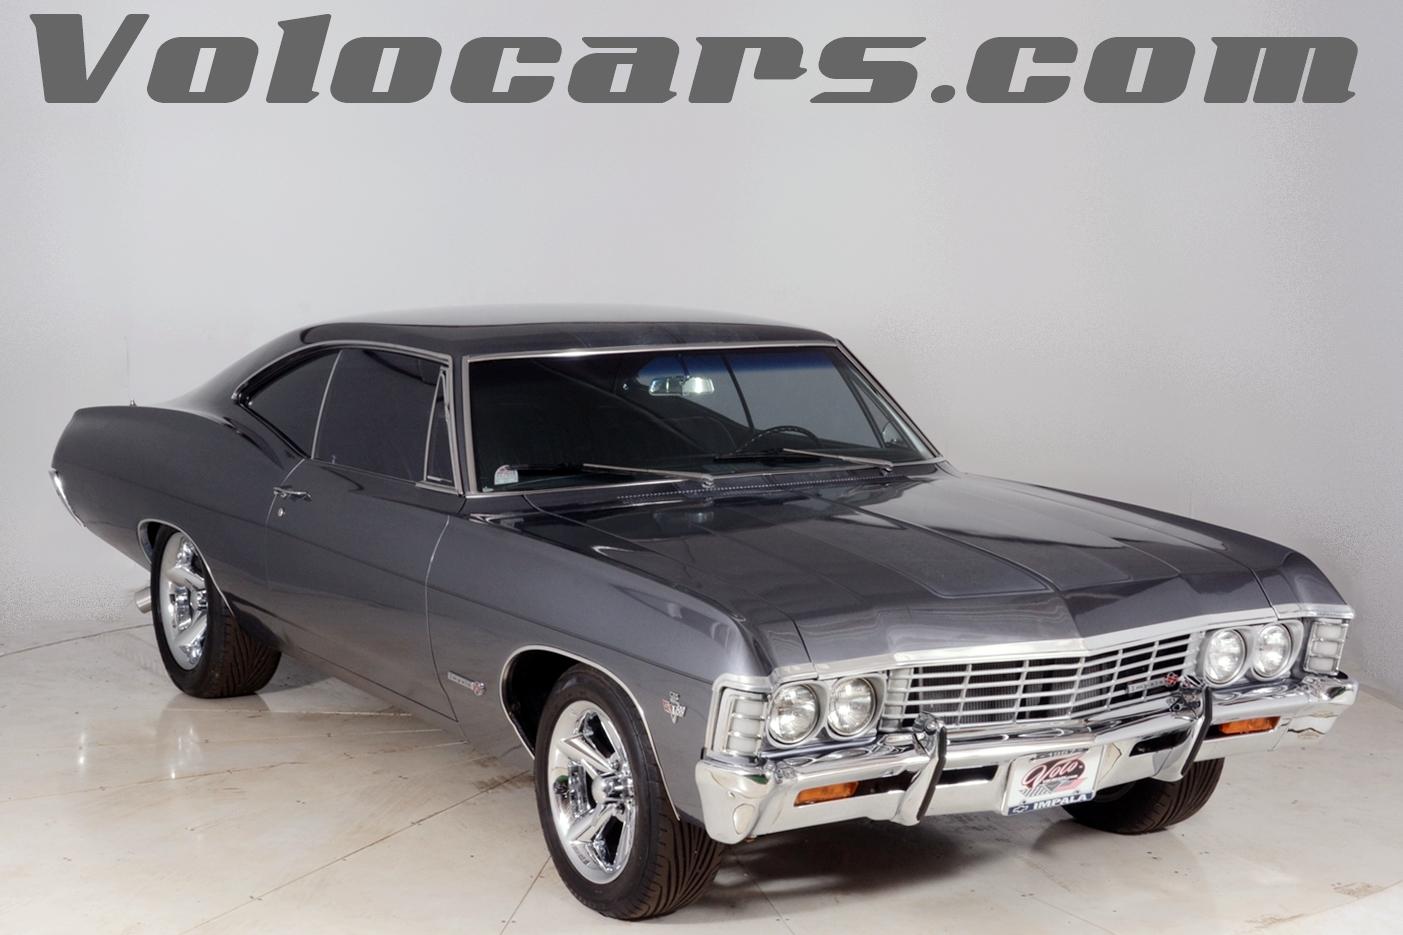 1967 chevrolet impala ss for sale 64717 mcg. Black Bedroom Furniture Sets. Home Design Ideas